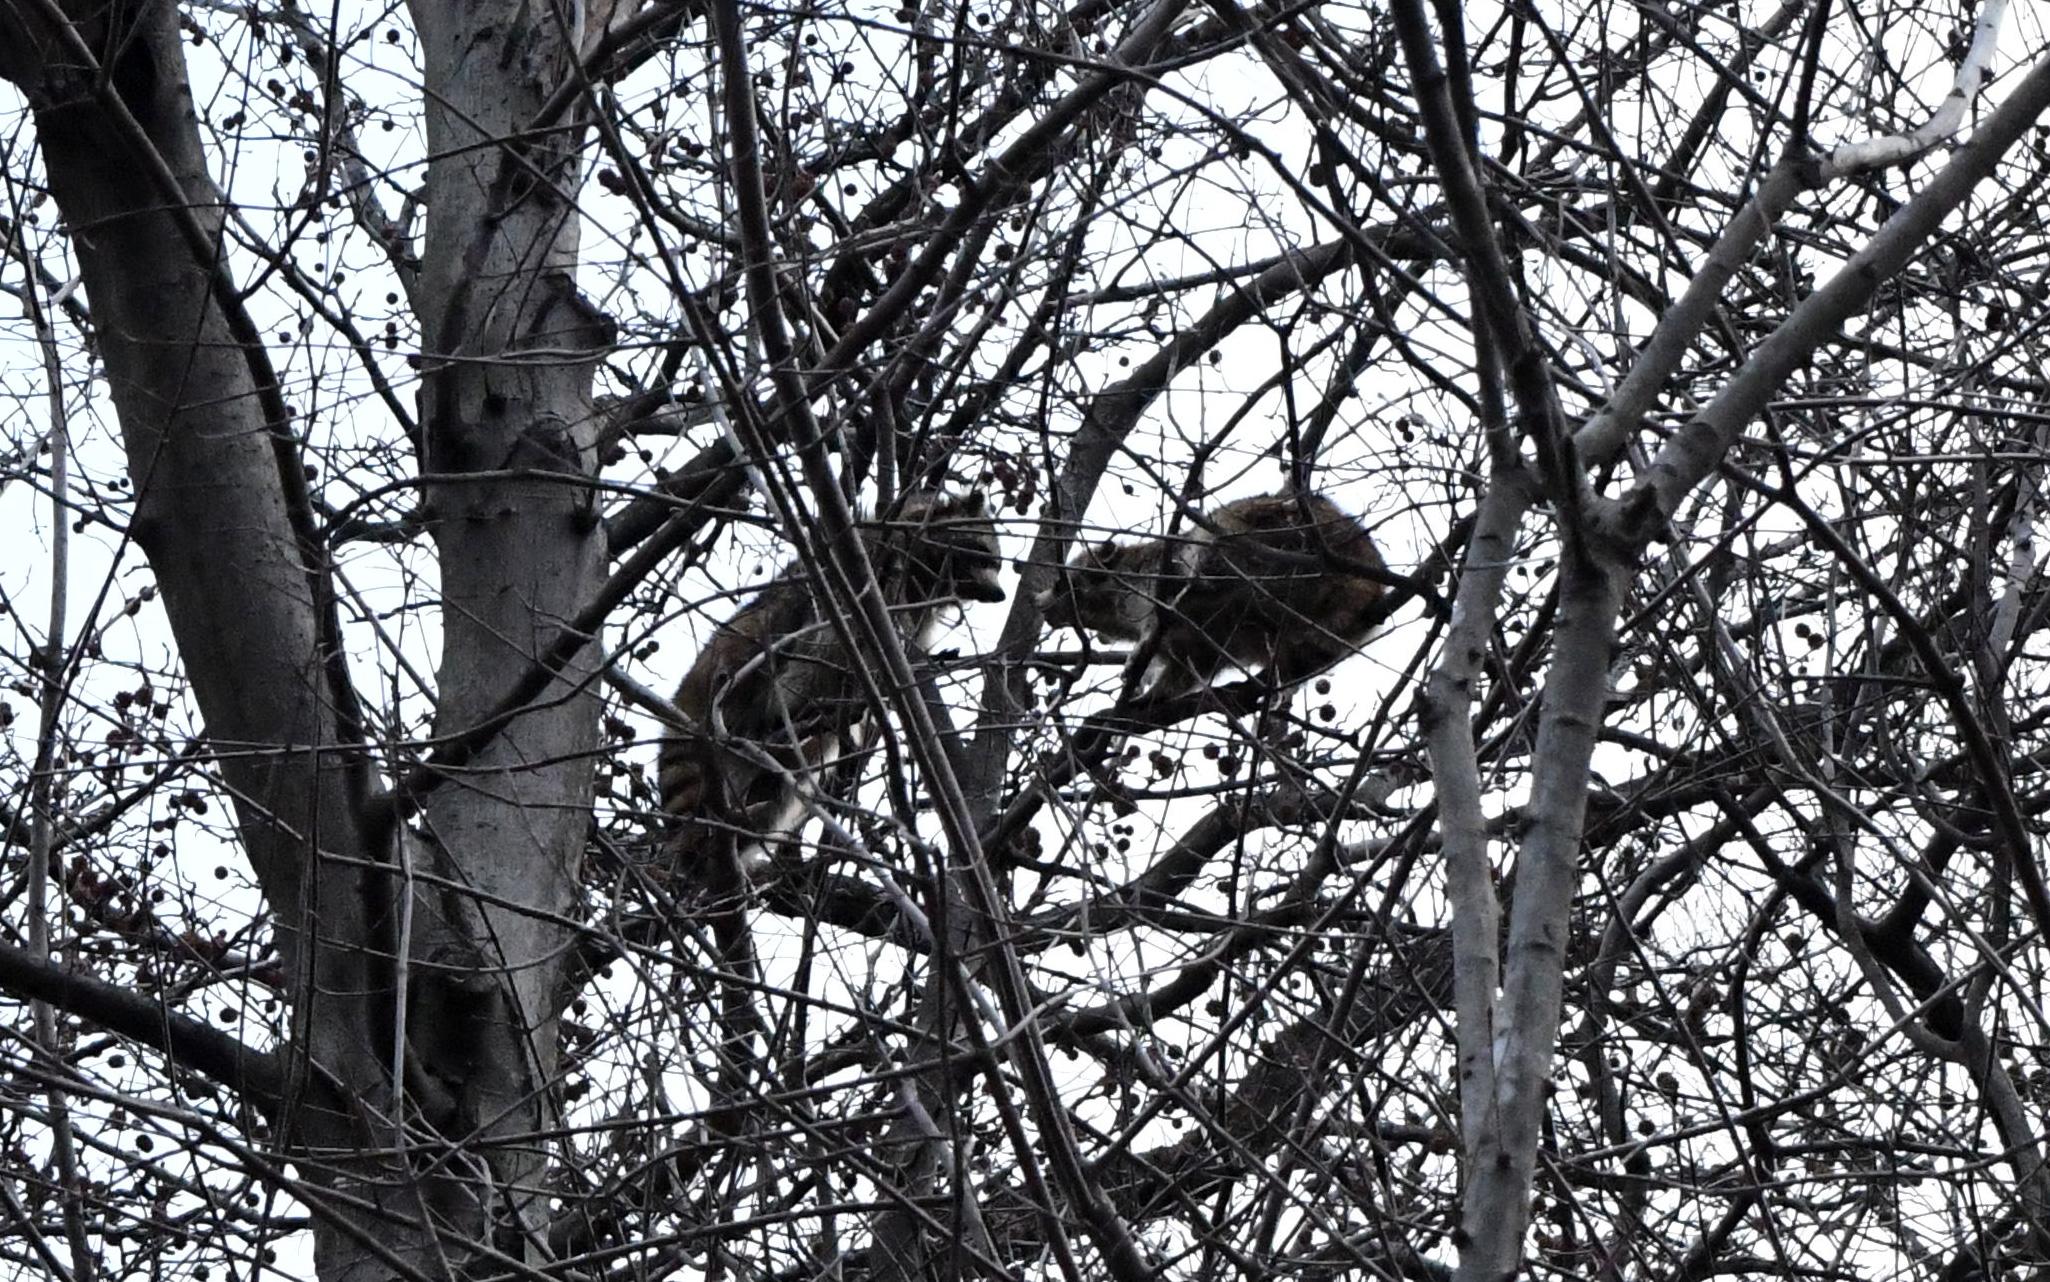 Raccoons in negotiation, Prospect Park